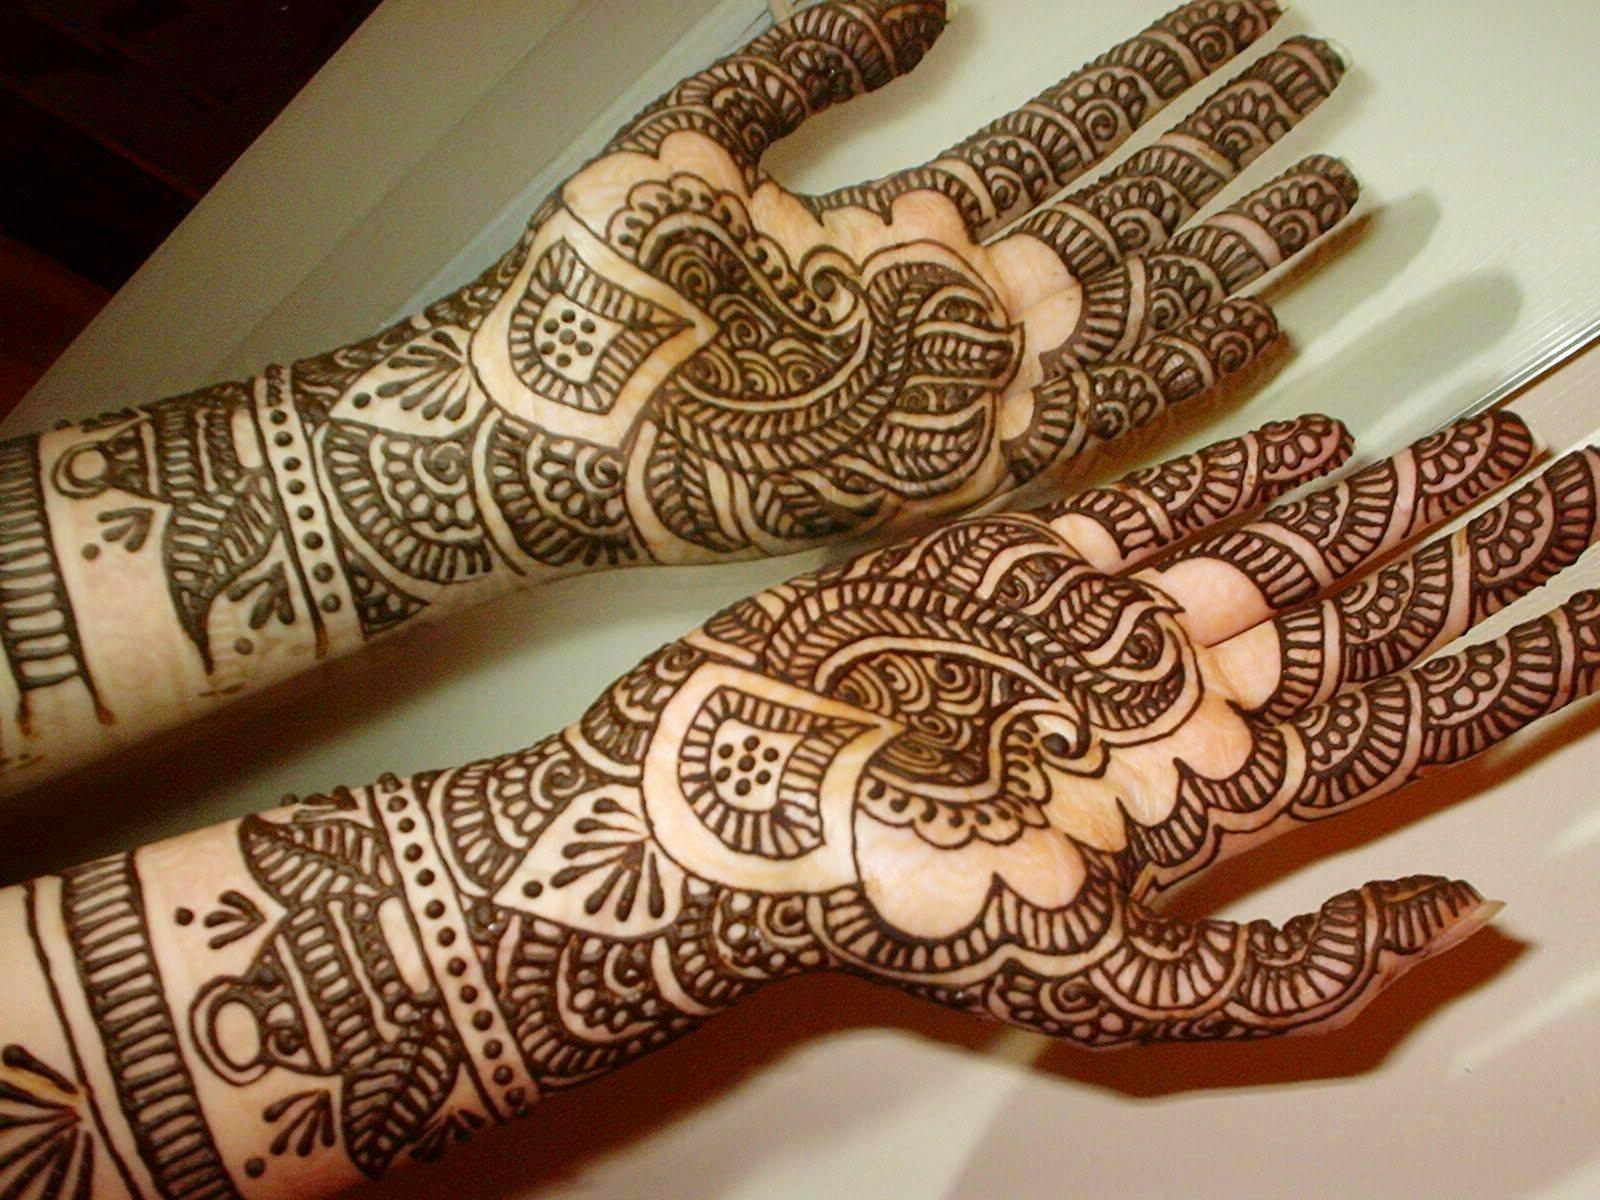 Mehndi Design Wallpaper - Easy Simple Indian Mehndi Design , HD Wallpaper & Backgrounds